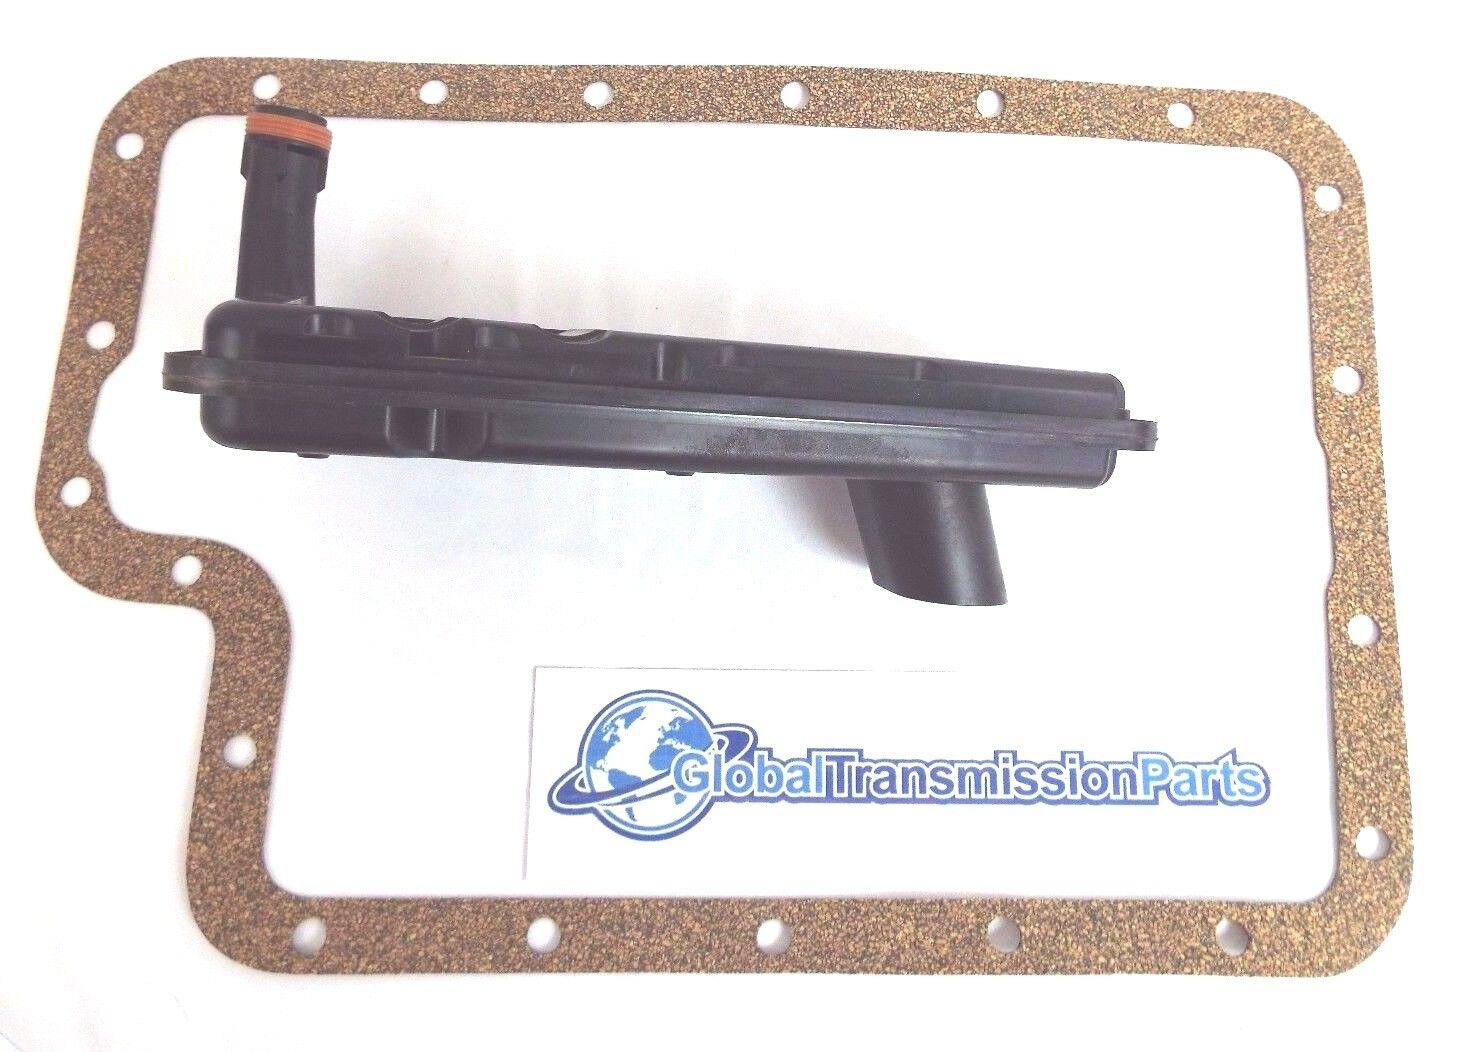 Cork Pan Gasket Service Kit 4WD Ford E4OD 4R100 Transmission 4X4 Oil Filter